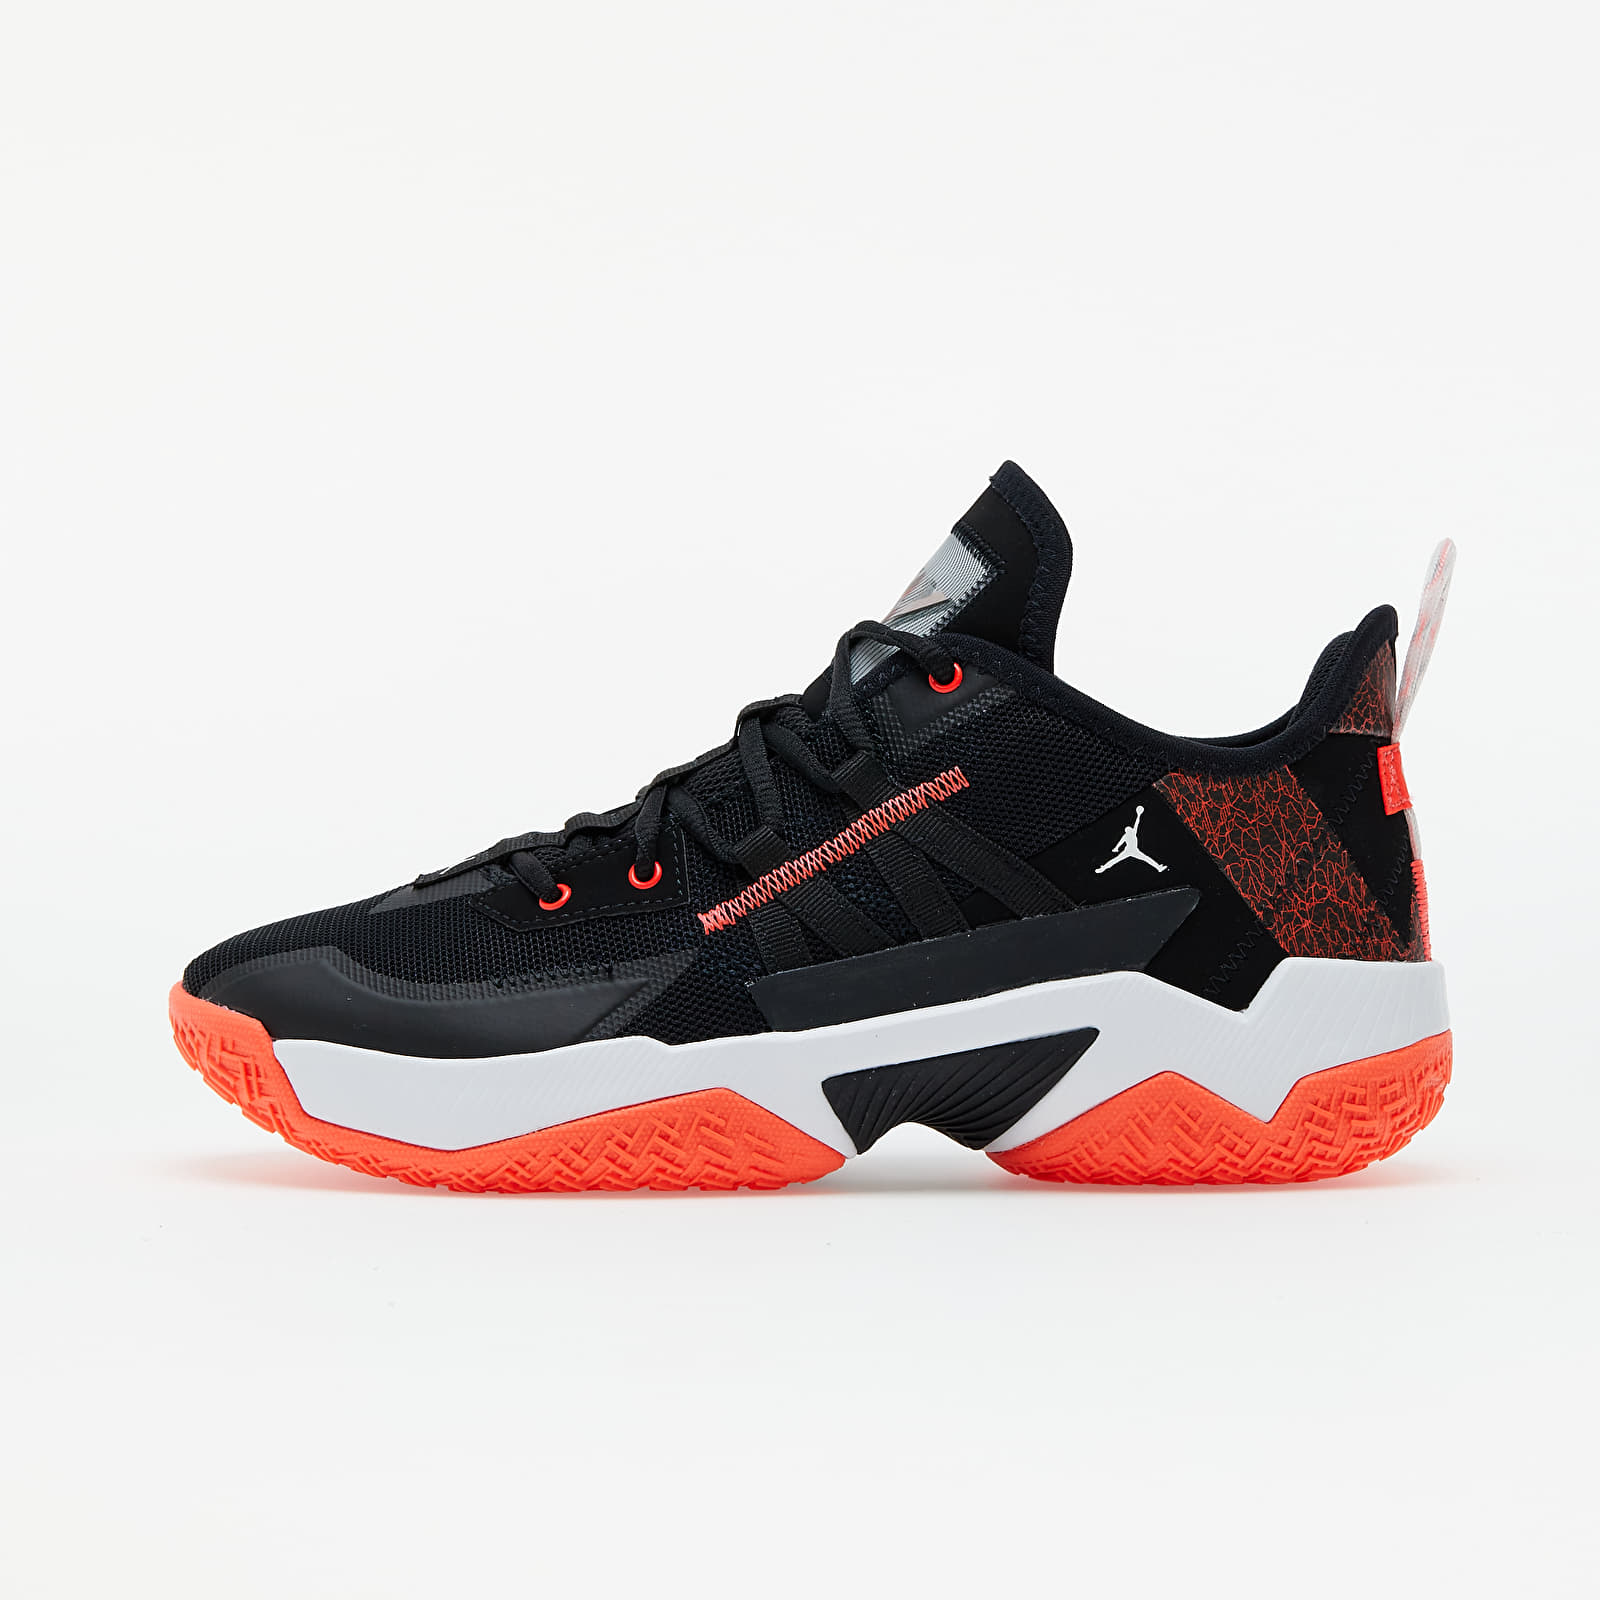 Jordan One Take II Black/ Bright Crimson-White EUR 44